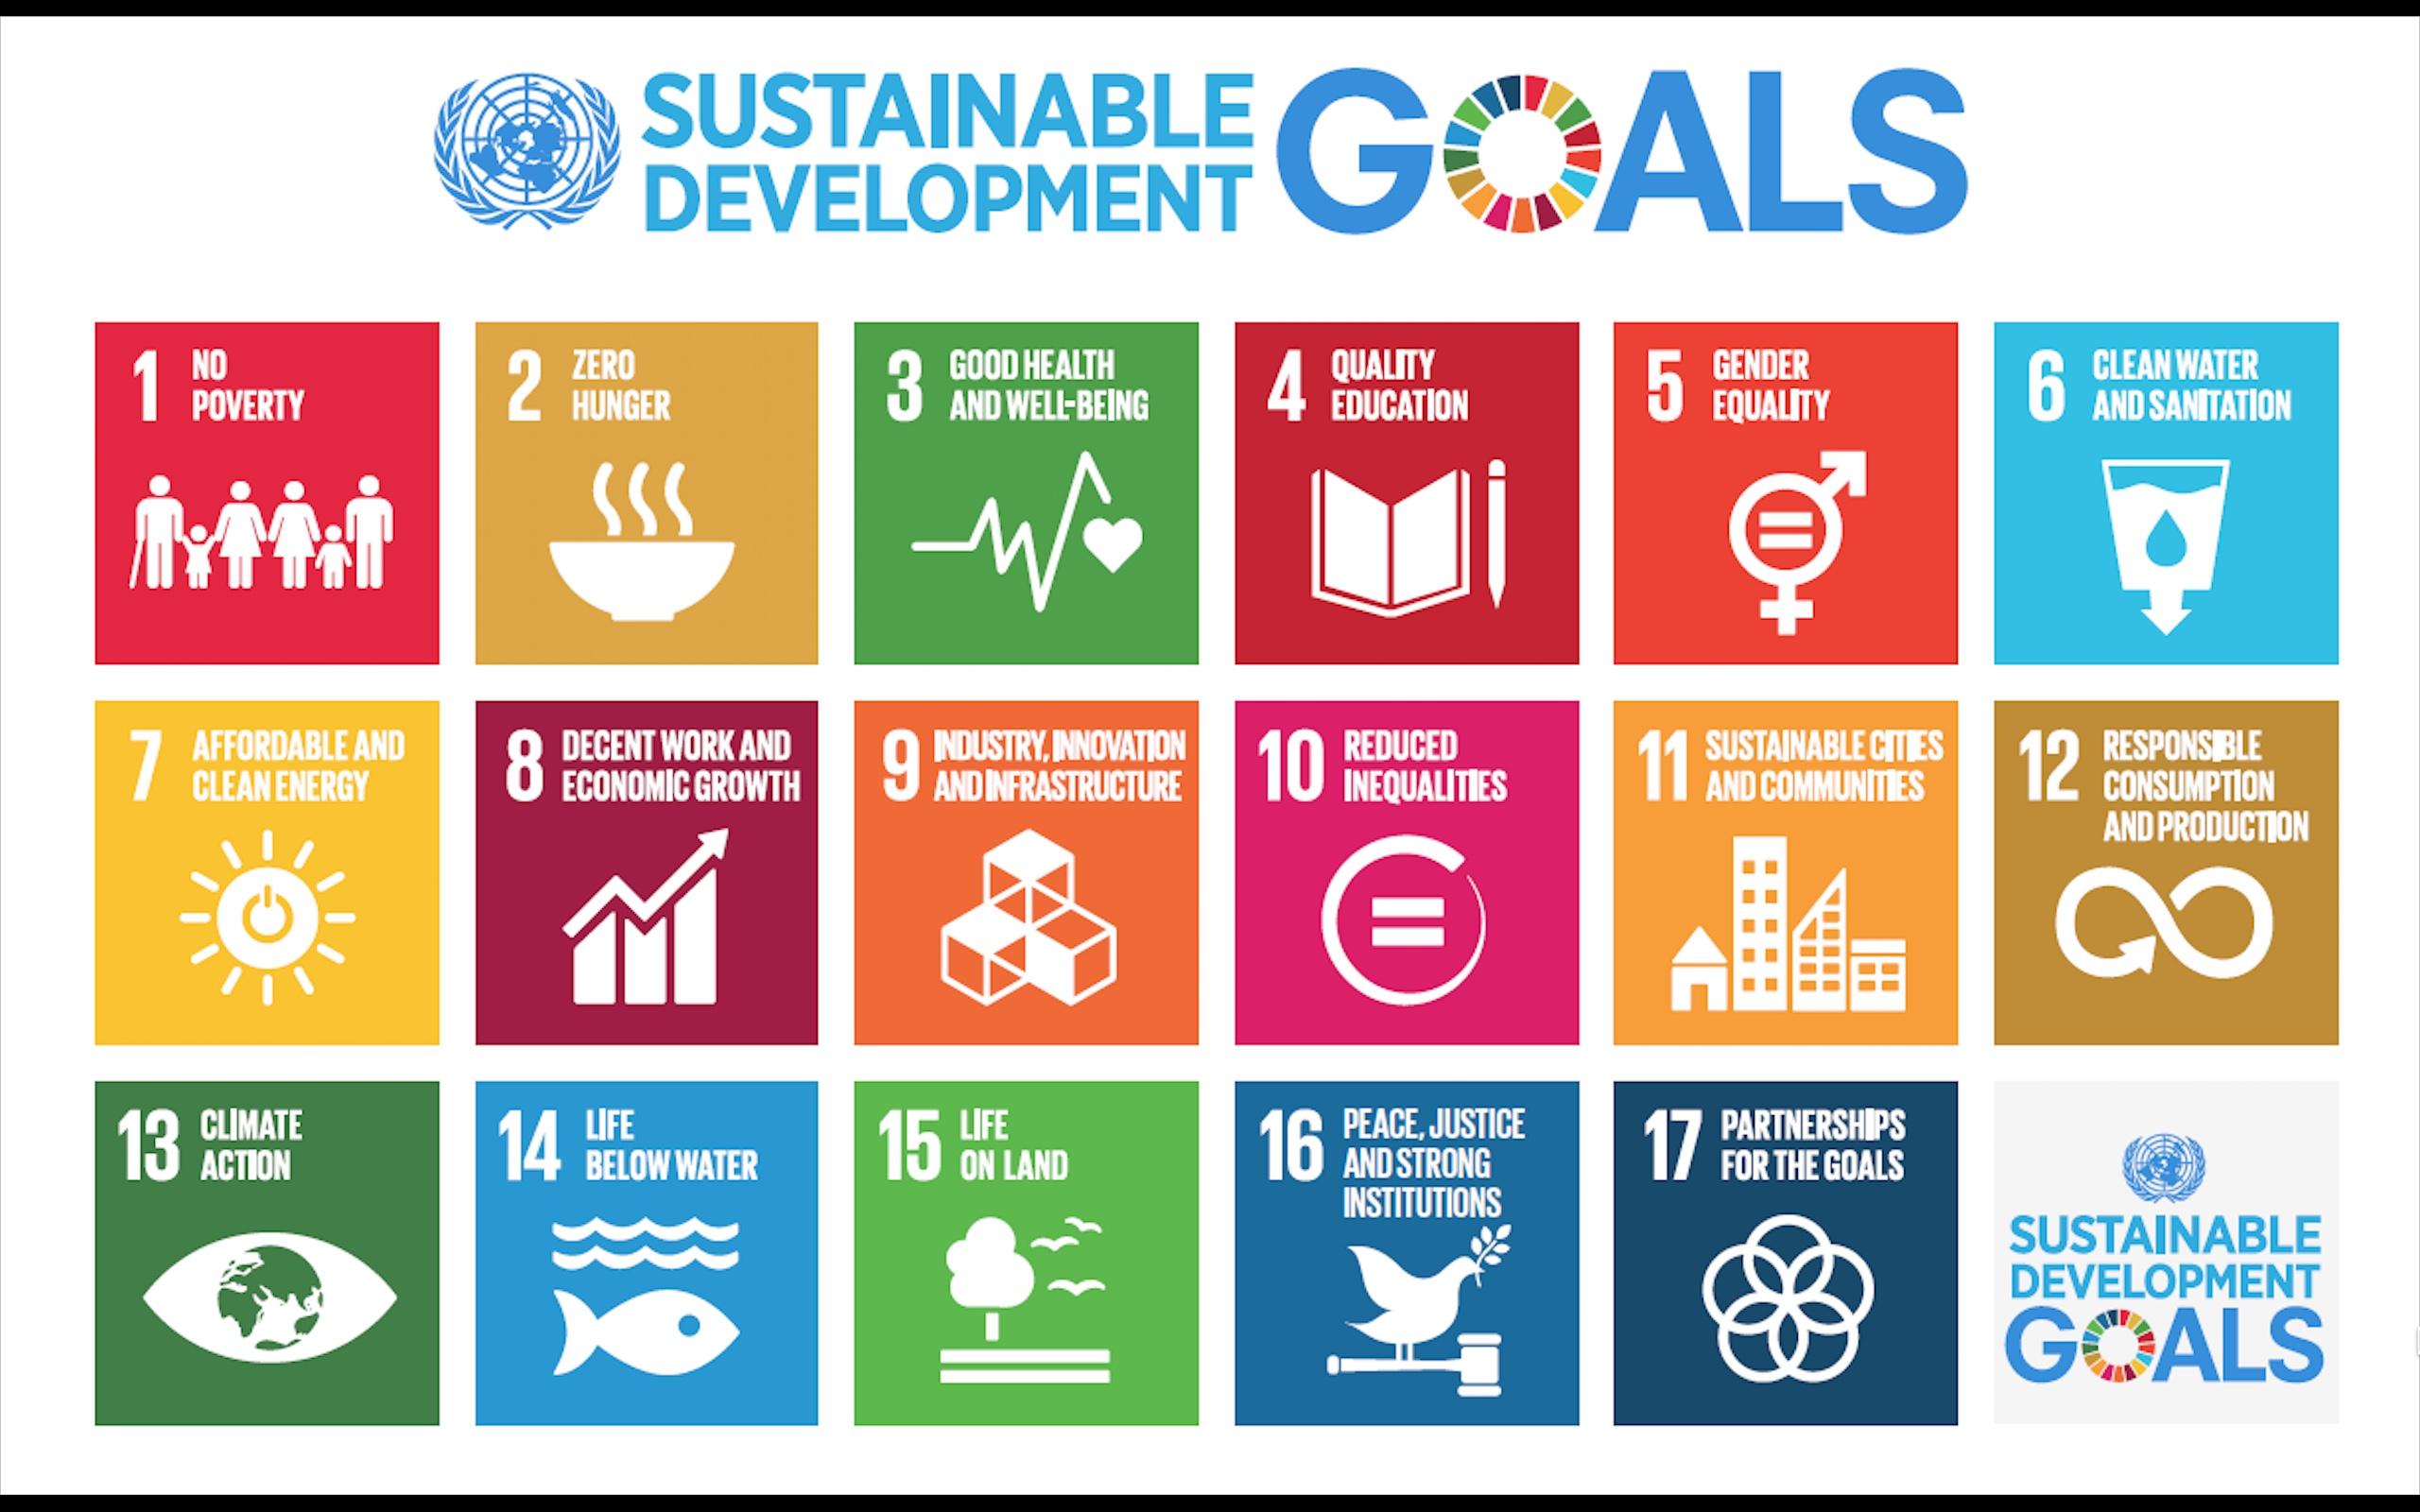 Sustainable_Development_Goals for sustainable development